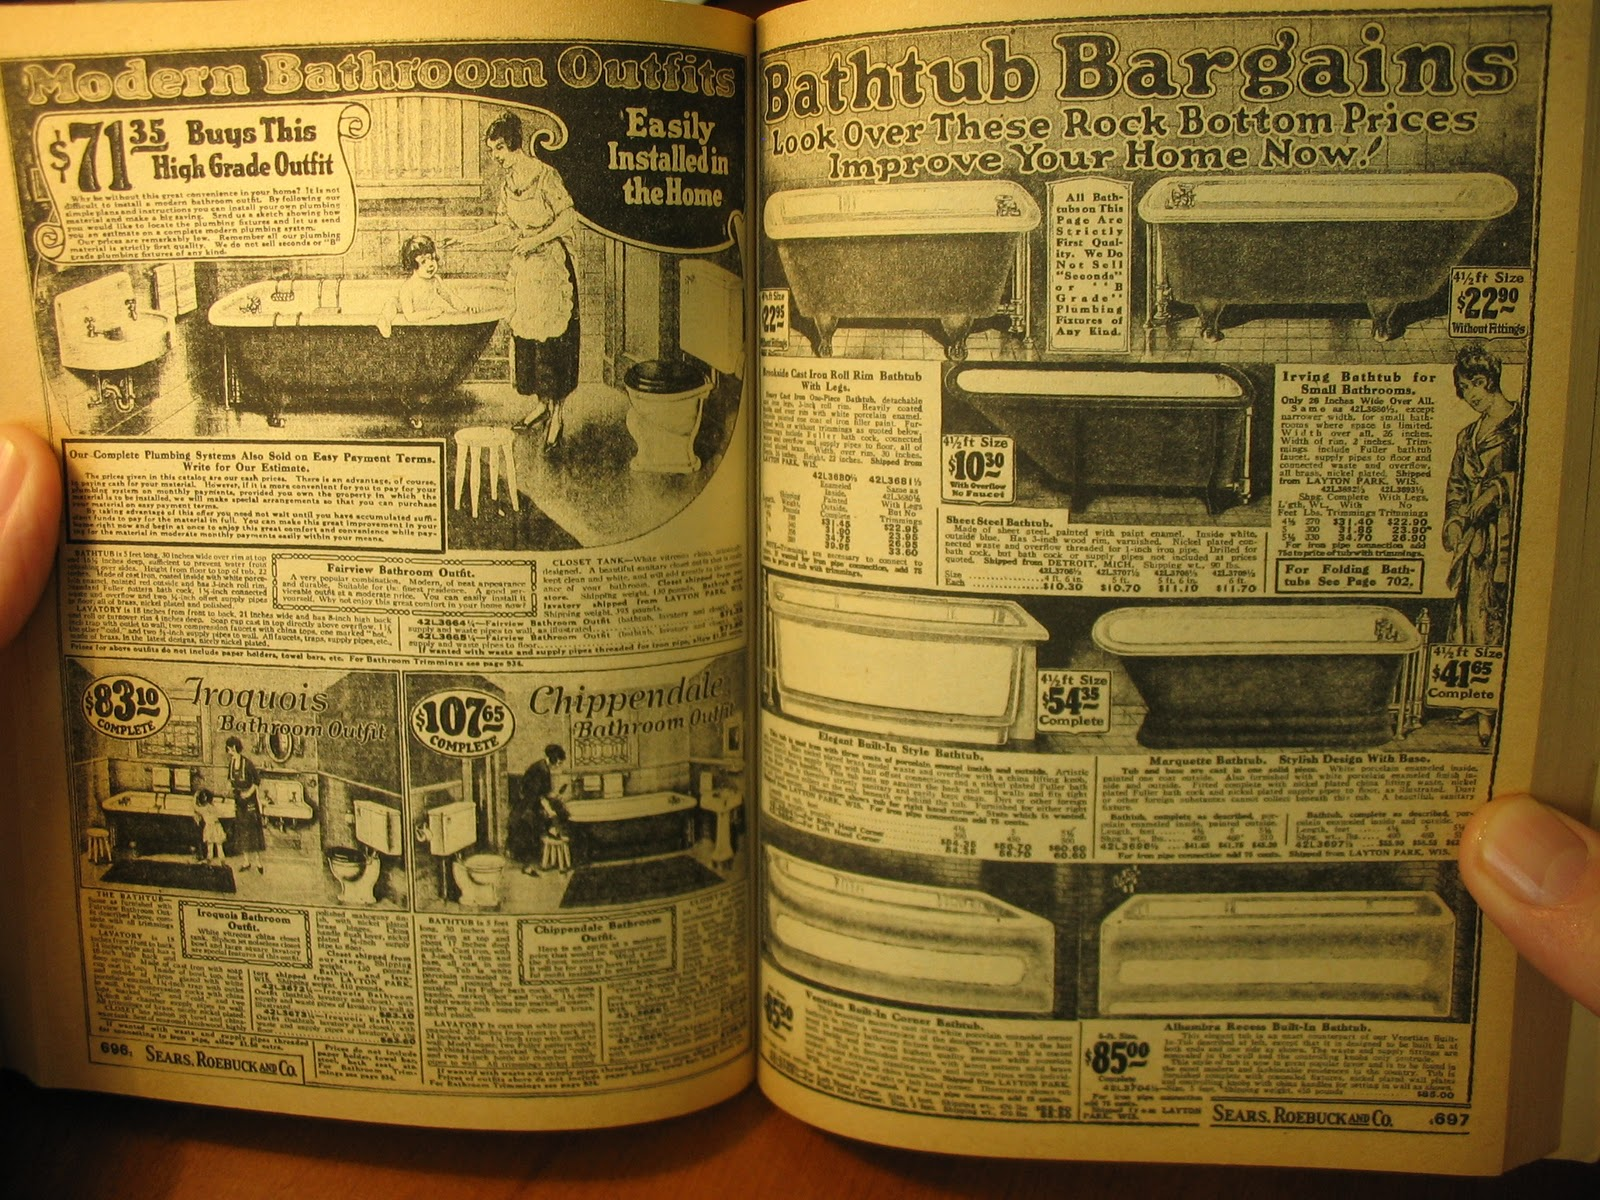 Lyrics Of Love And Lore: The 1923 Sears-Roebuck Catalogue